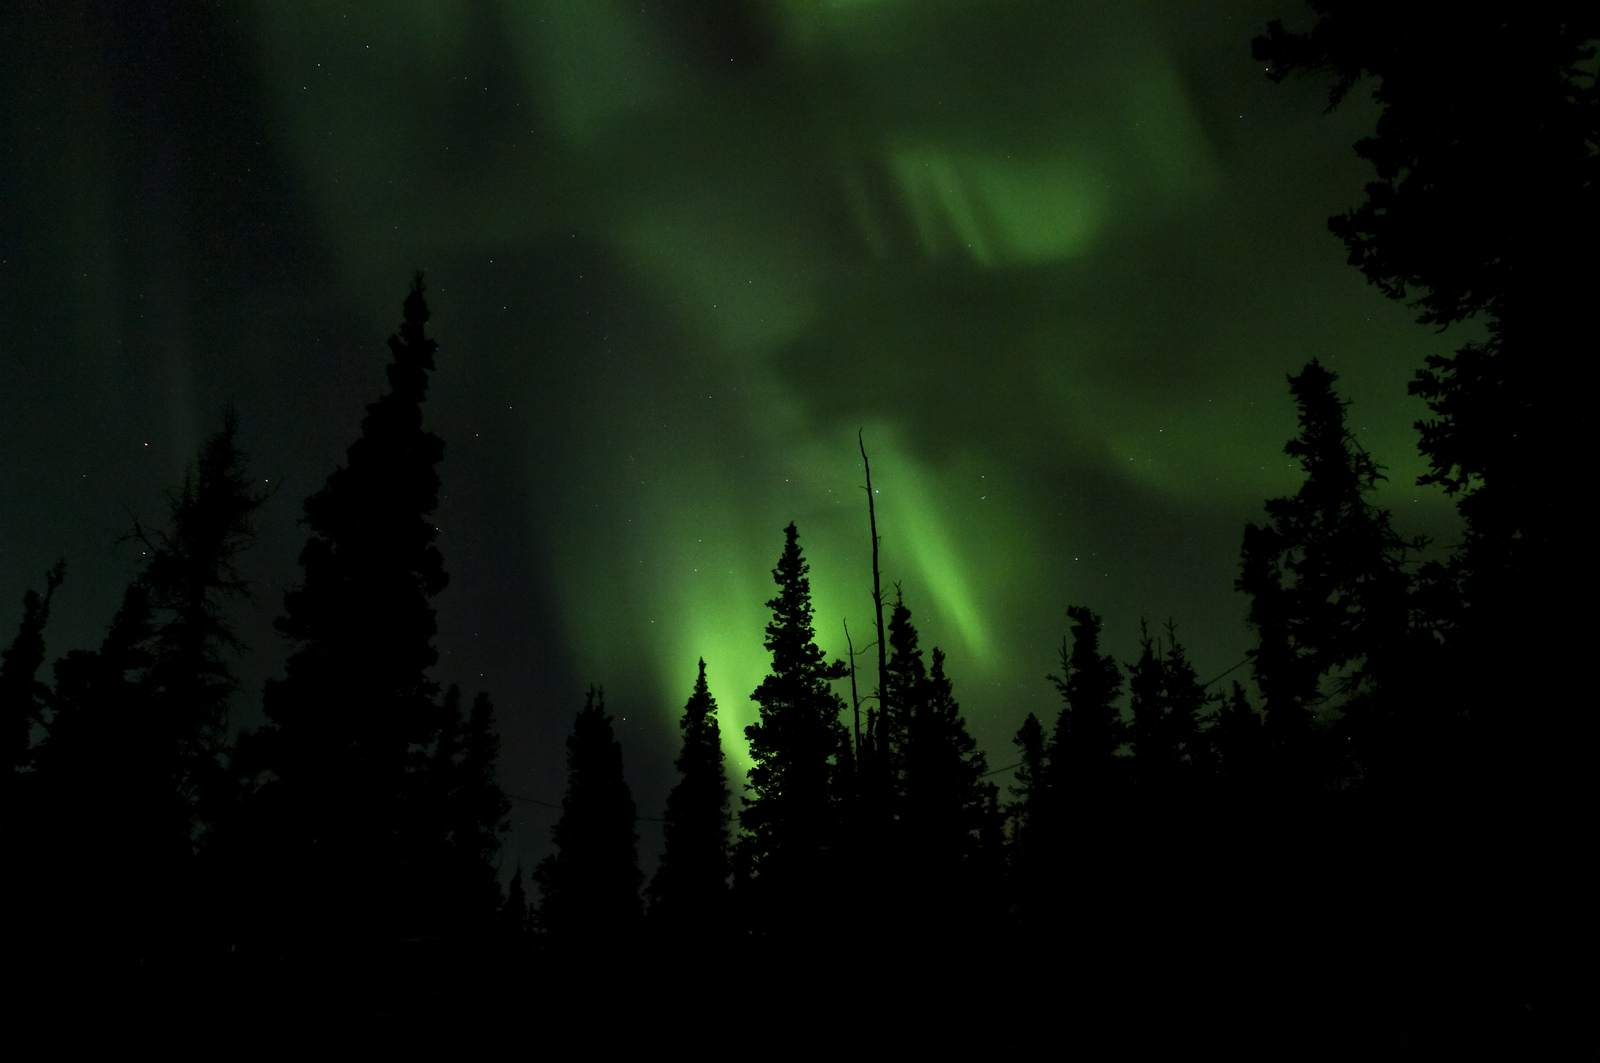 aurora borealis2 Aurora over Denali National Park and Preserve